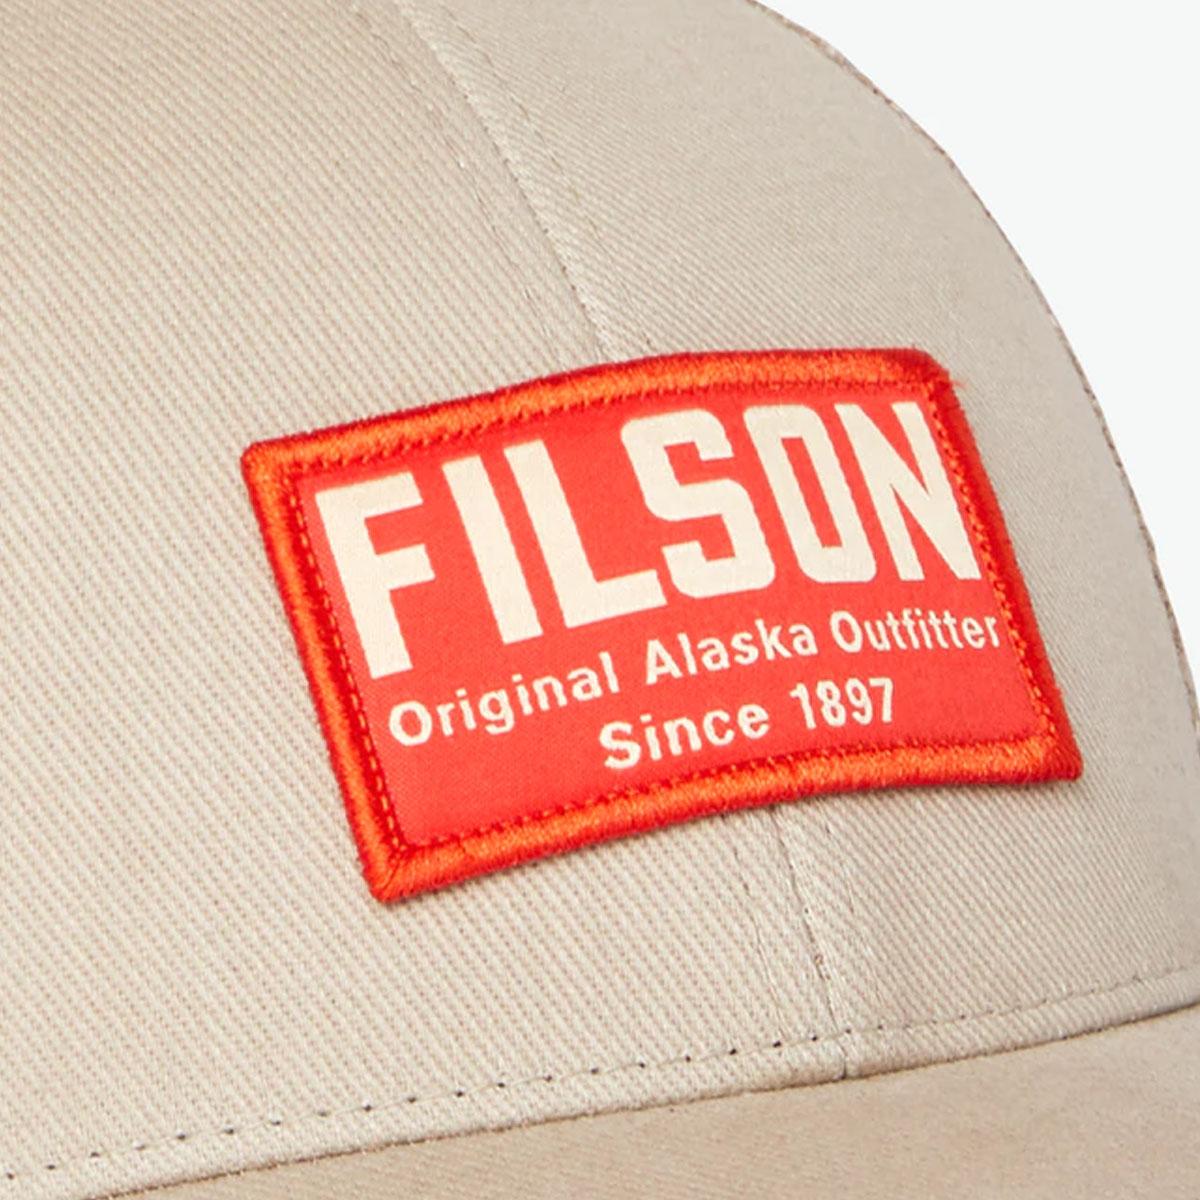 Filson Mesh Snap-Back Logger Cap 20204520-Khaki, Robustes 6 Panel Logger Cap mit Mesh Panels für optimale Belüftung